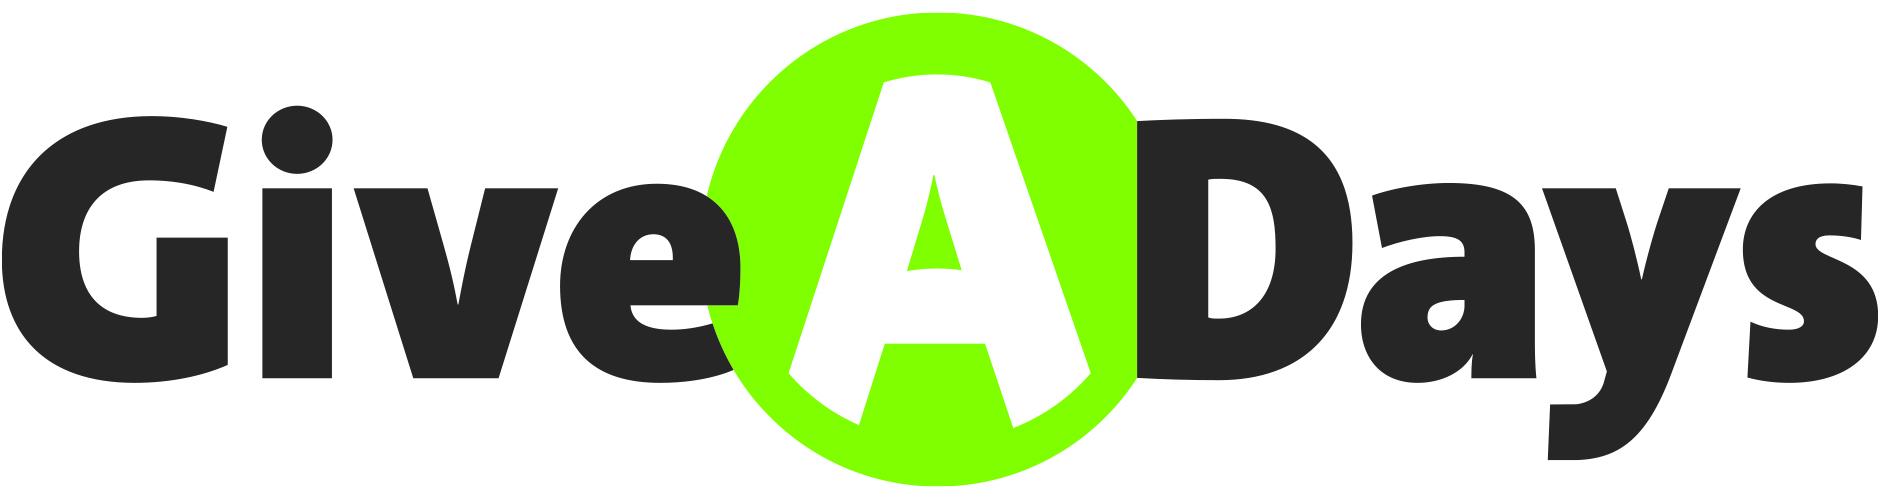 GiveADays_logo